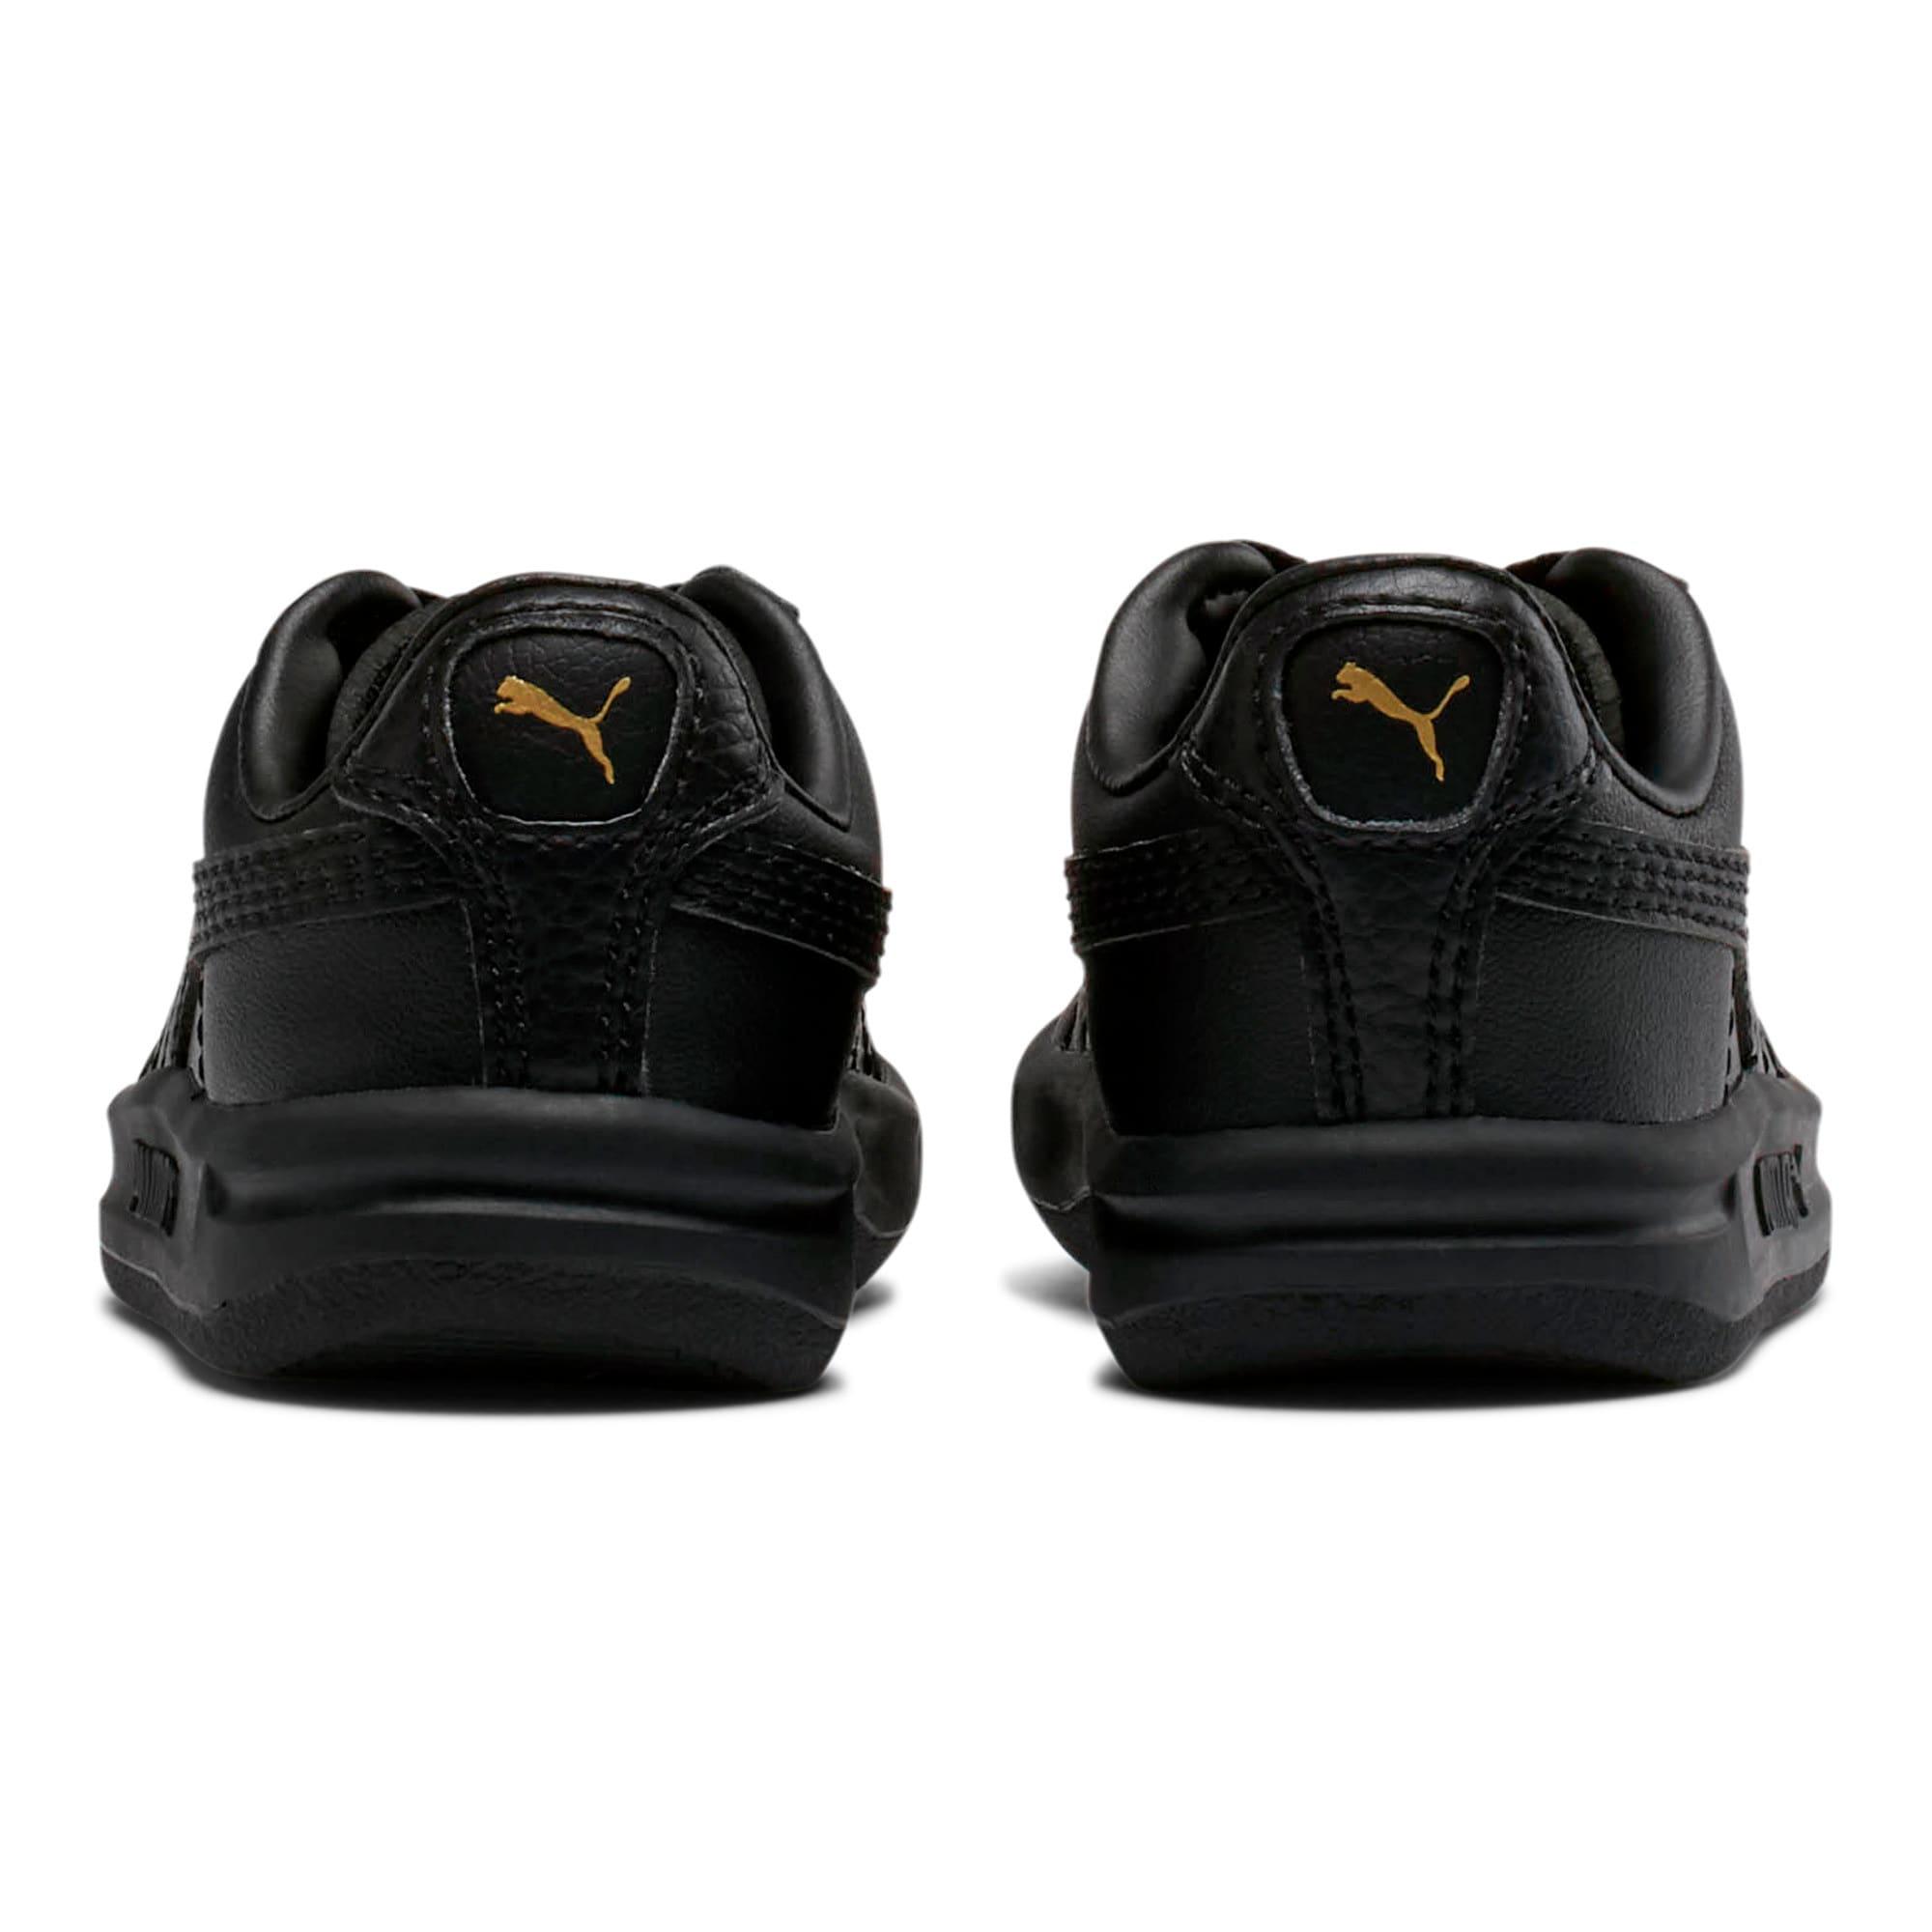 Thumbnail 4 of GV Special Toddler Shoes, Puma Black-Puma Team Gold, medium